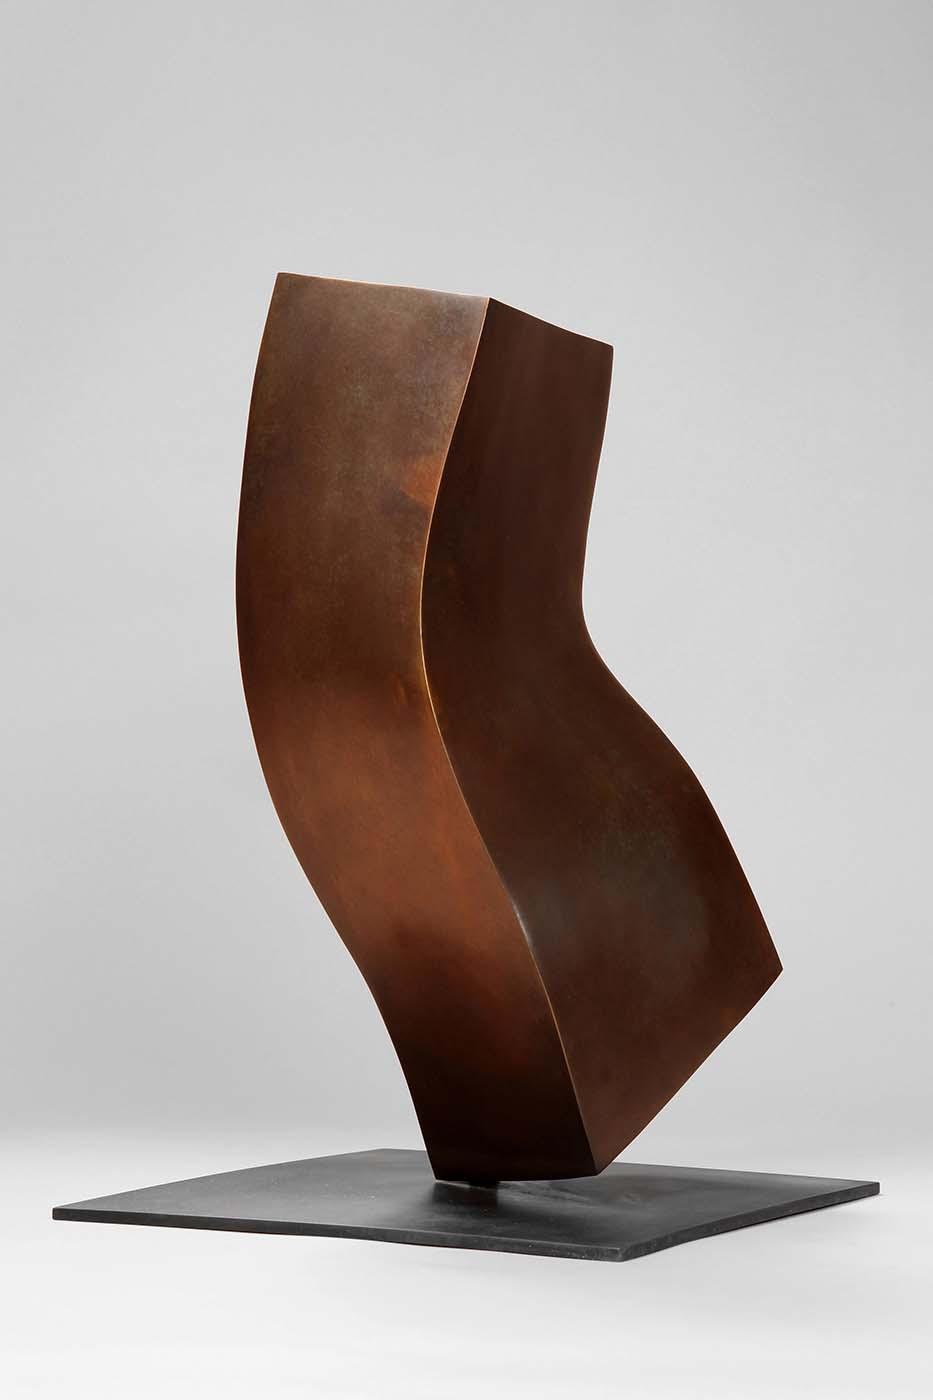 Anderer Gedanke, 2010, Bronze, 25 x 25 x 40 cm (02)